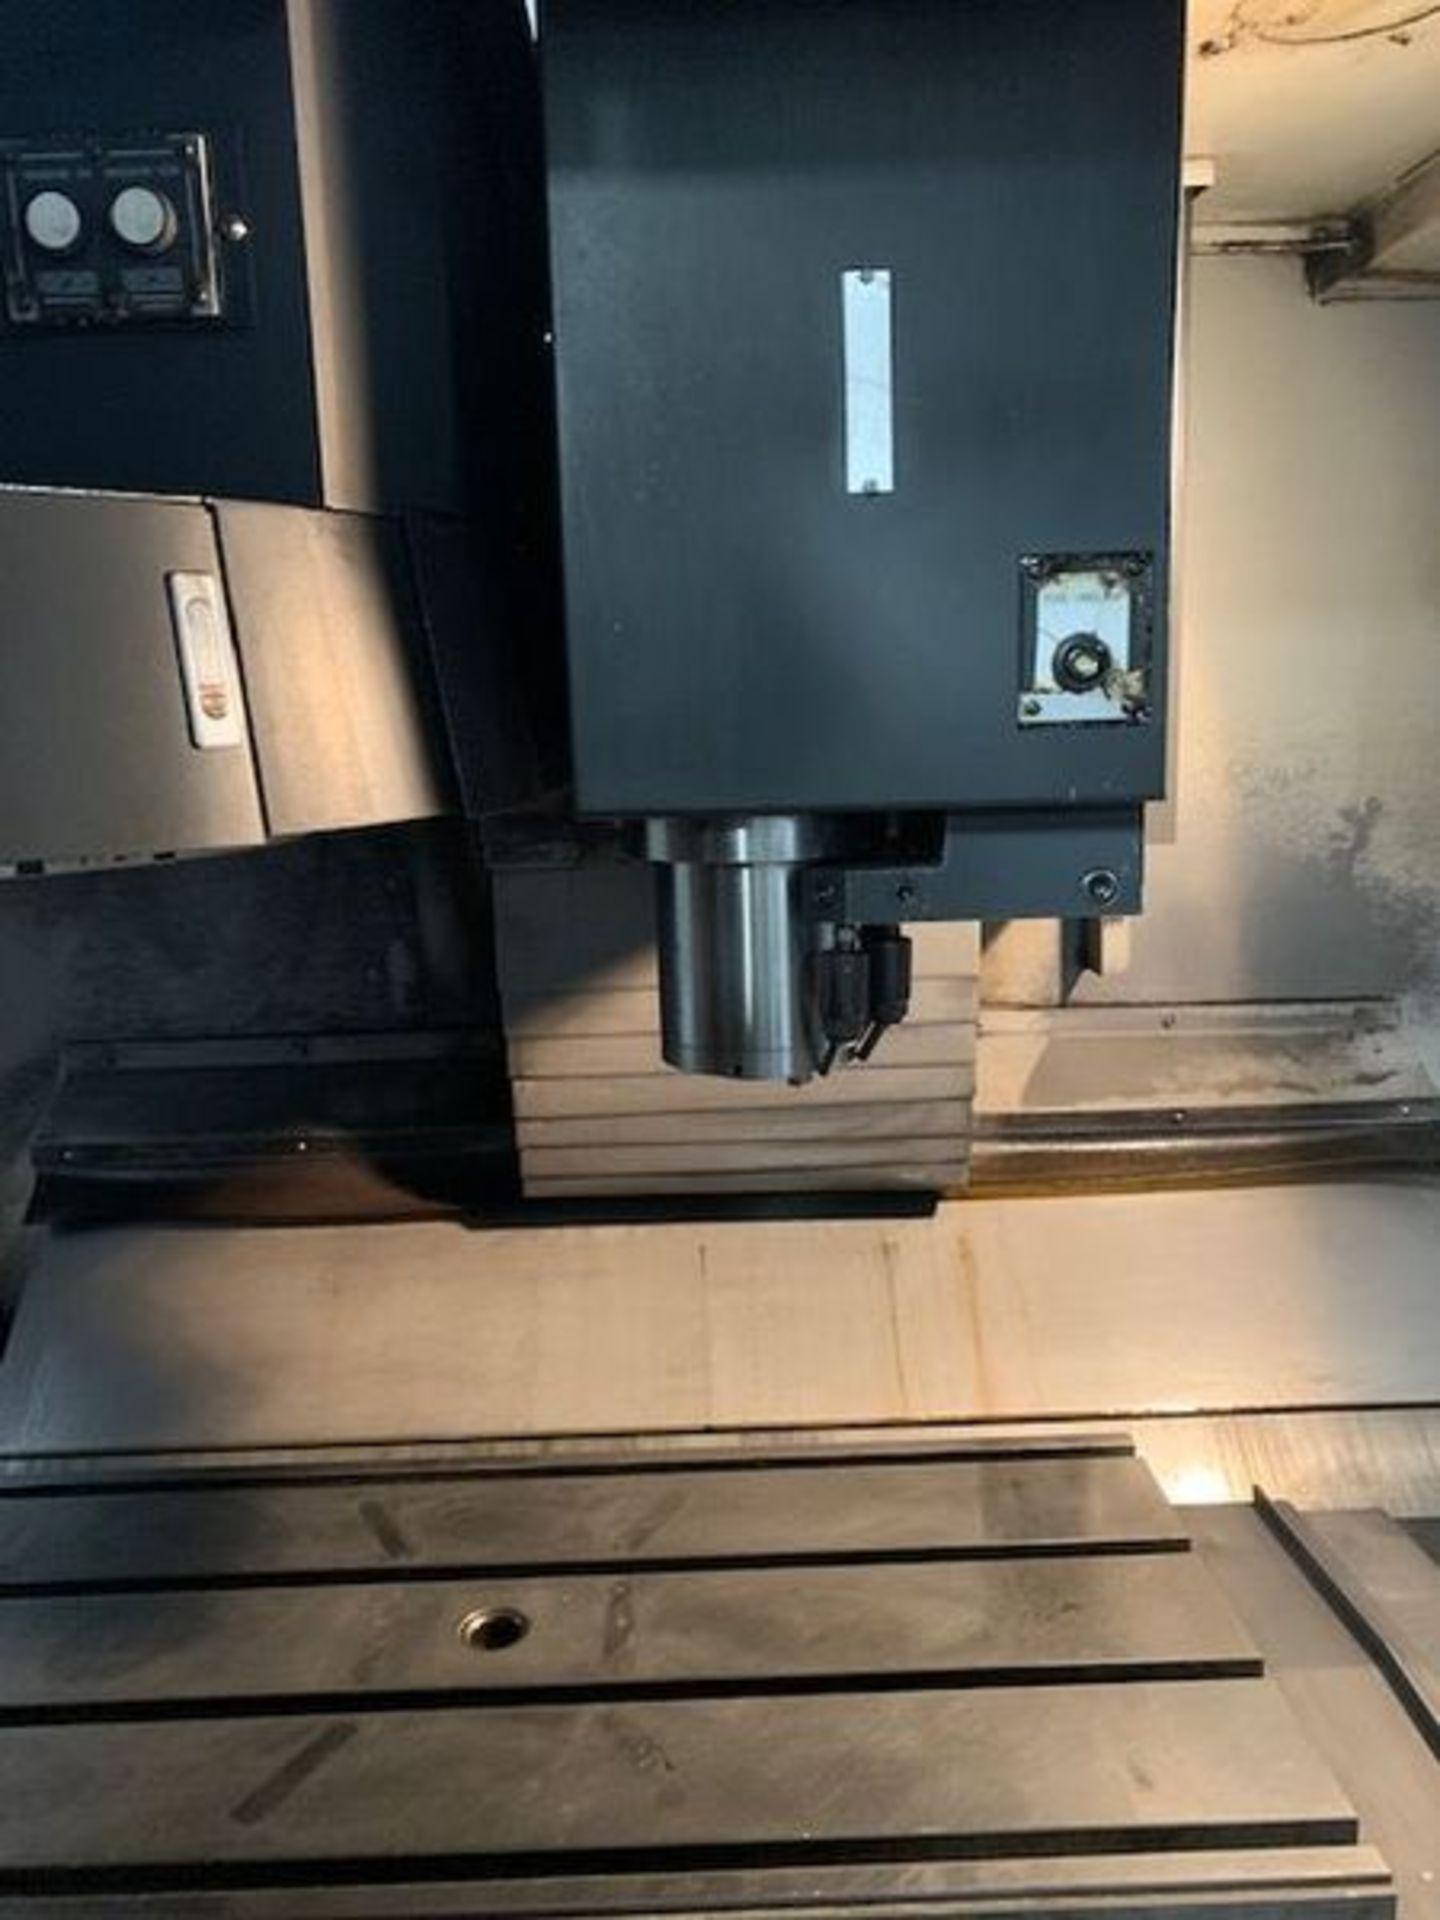 Lot 3D - 2007 DOOSAN MV-3016LD CNC VERTICAL MACHINING CENTER WITH THROUGH SPINDLE COOLANT & CHIP CONVEYOR, X: